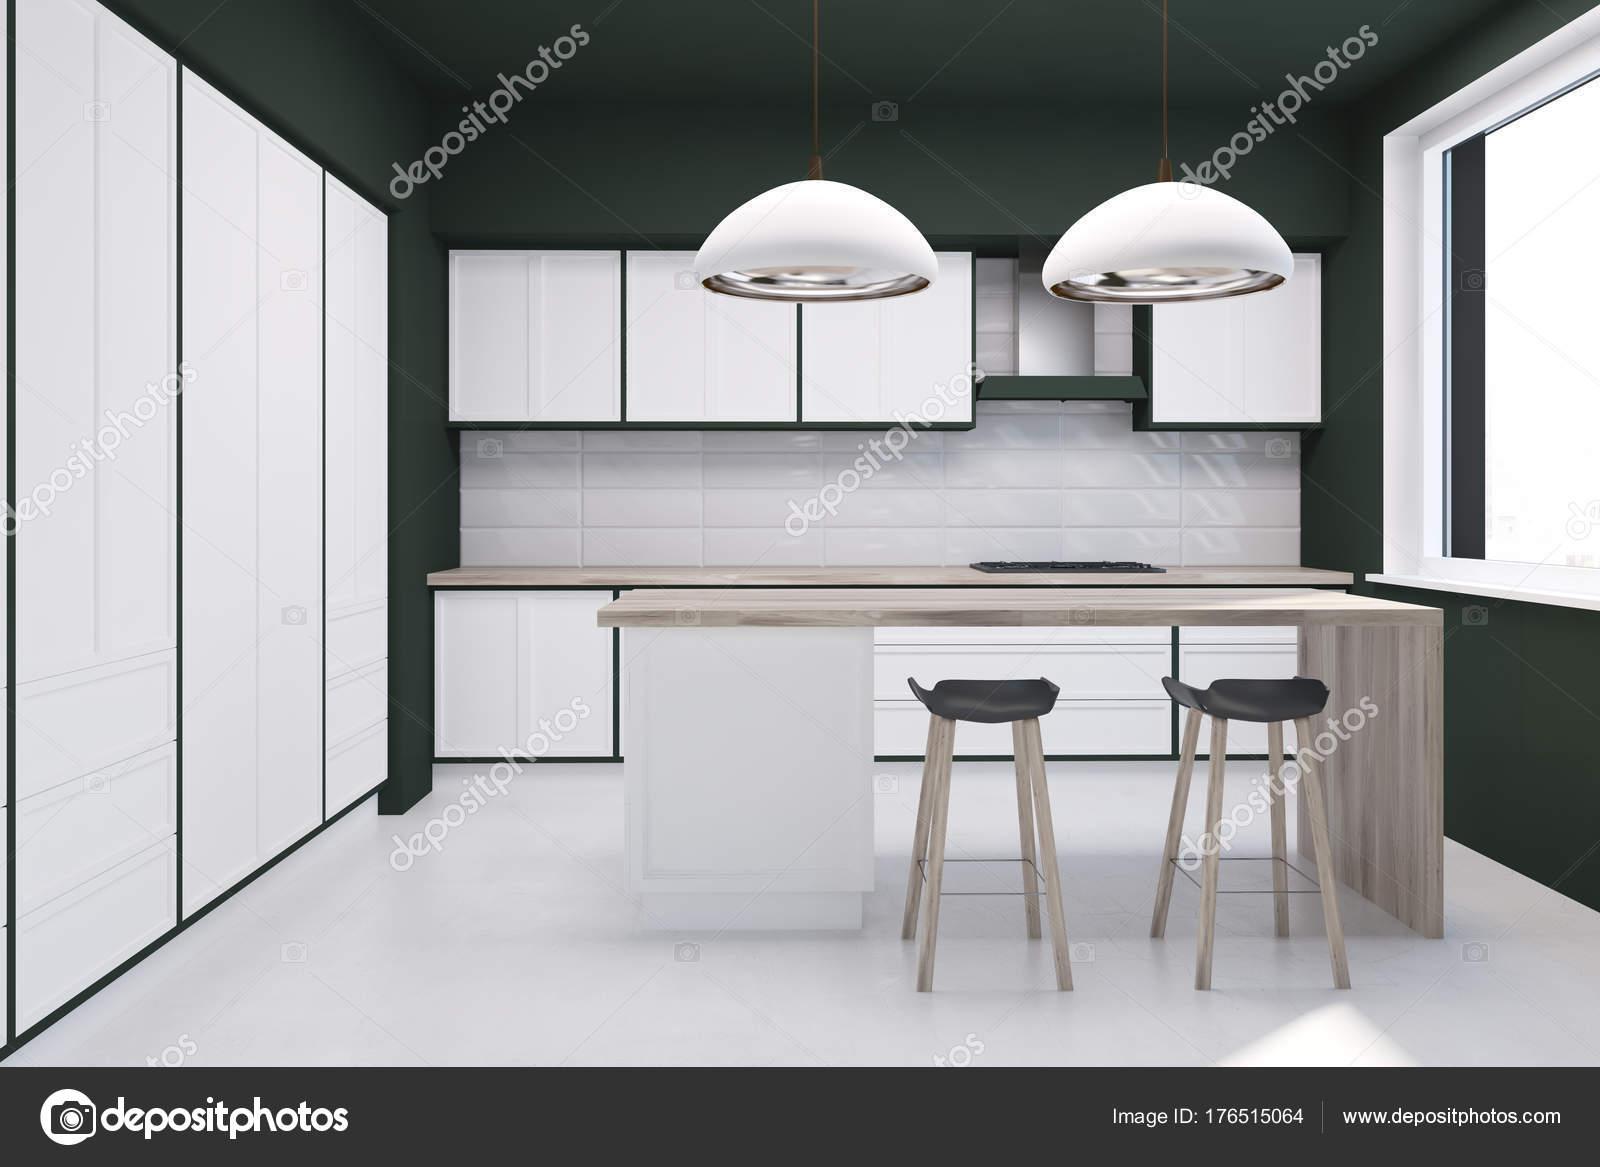 Cucina panoramica piastrelle bianche — Foto Stock © denisismagilov ...